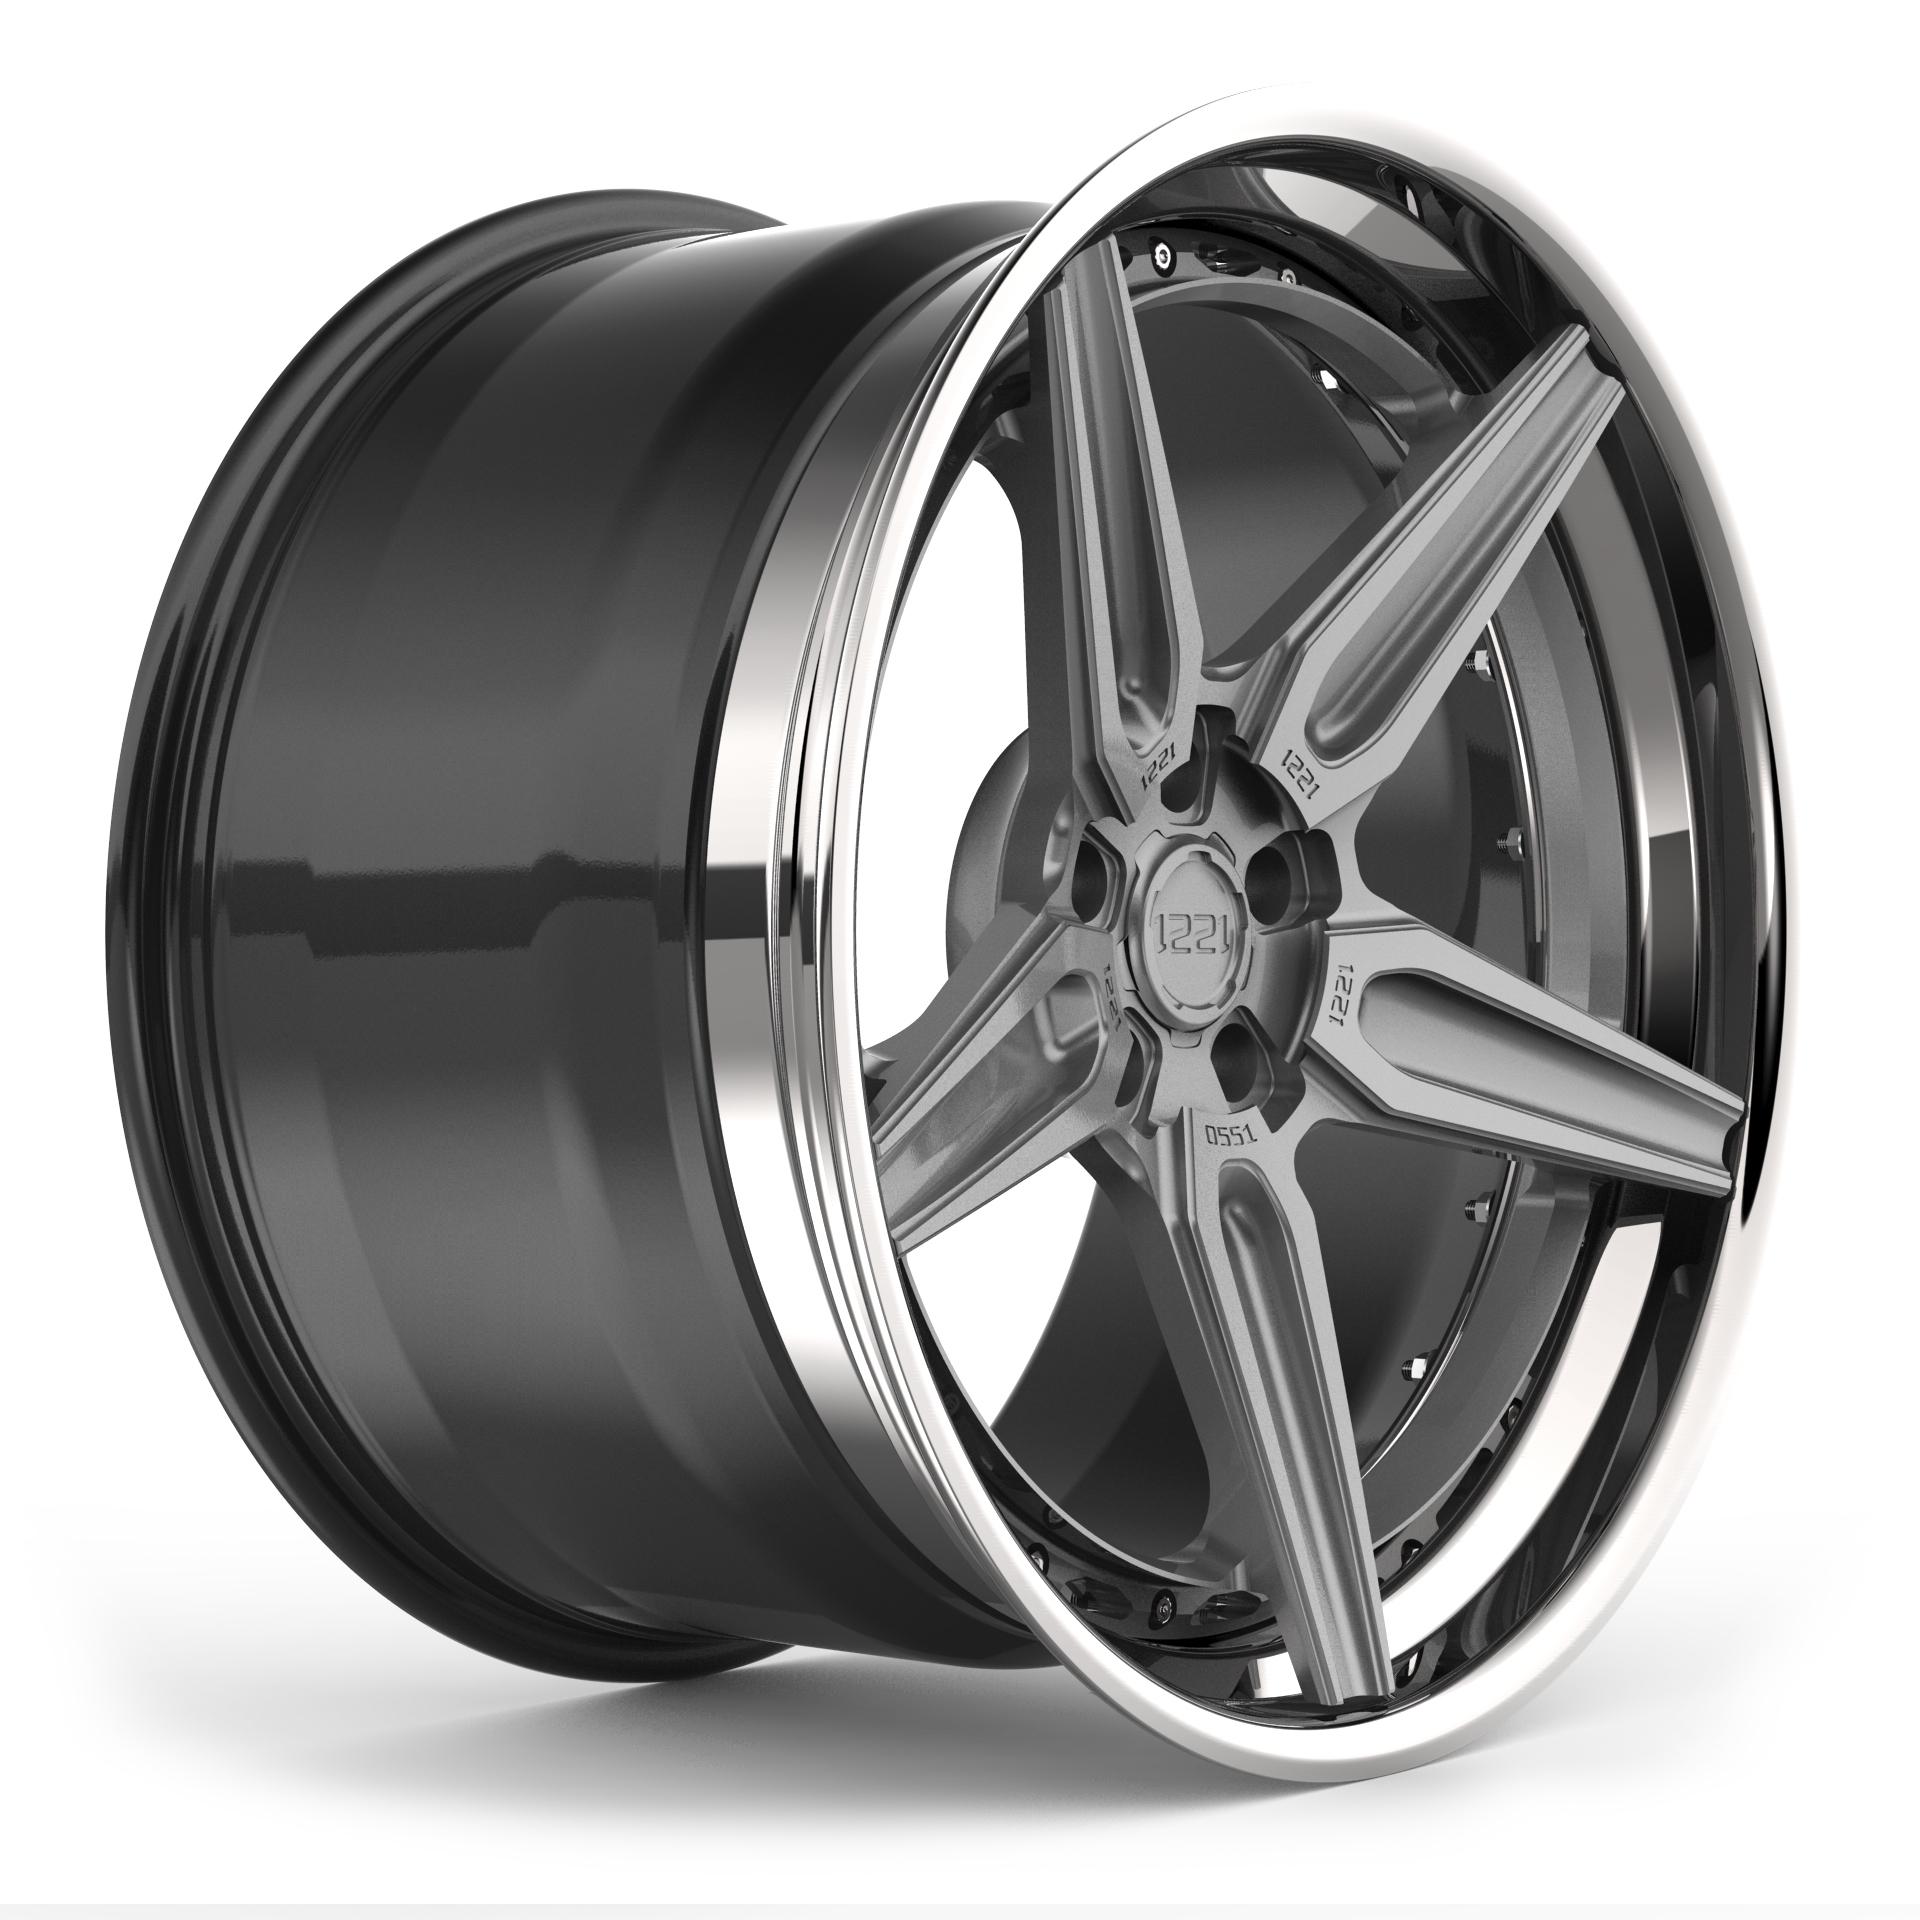 1221 Wheels 0551 AP3LX APEX3.0 forged wheels